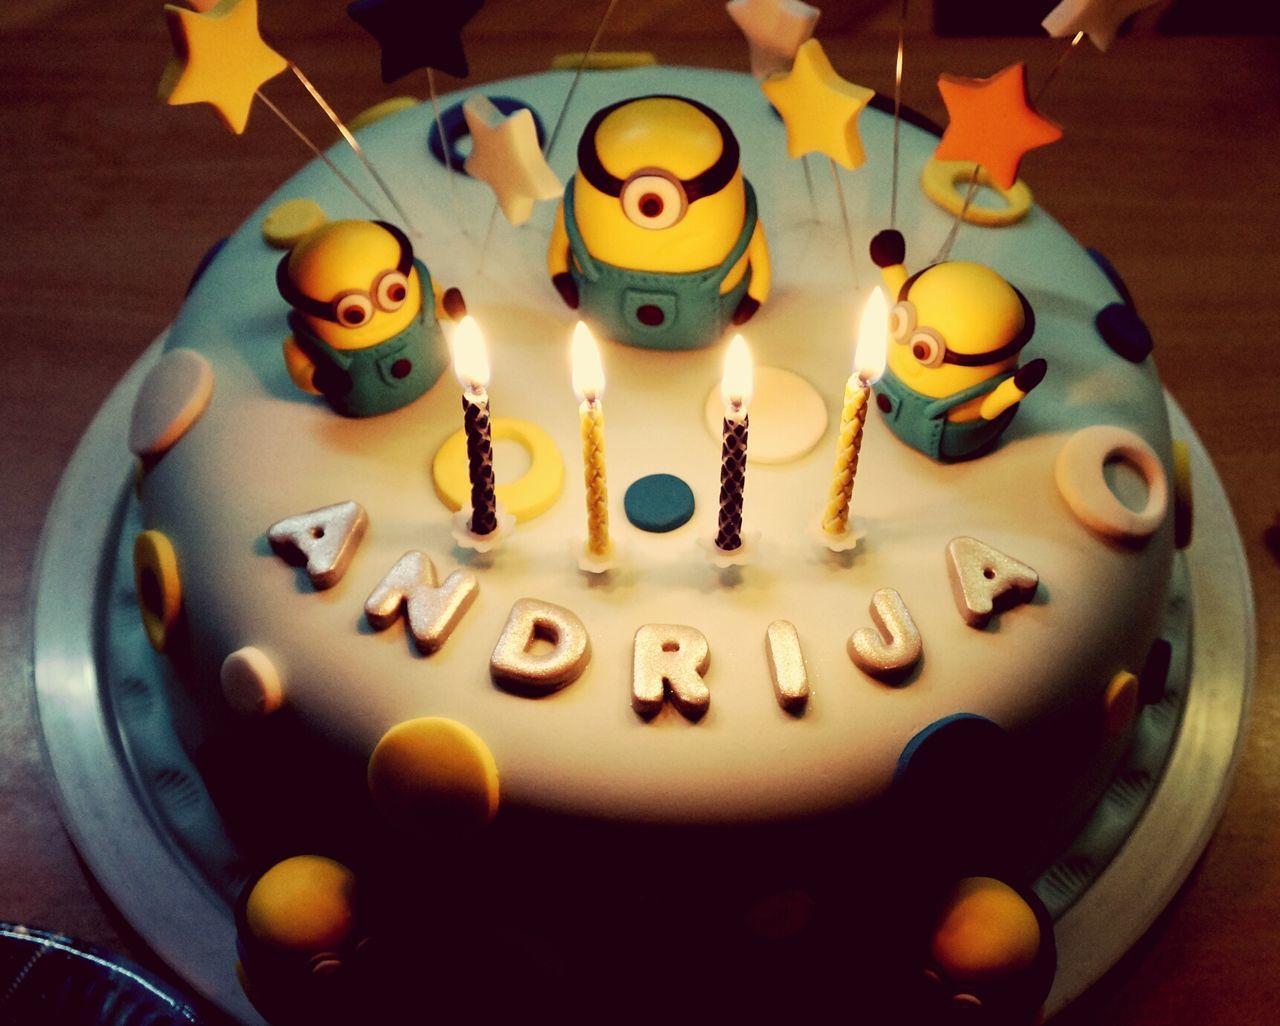 Birthday Cake Birthdaycake Birthday Celebration Birthday Birthday Celebration! Birtdaycake Birthday Celebration Cake Cakeporn Cakephotography Minions MinionLove Andrija